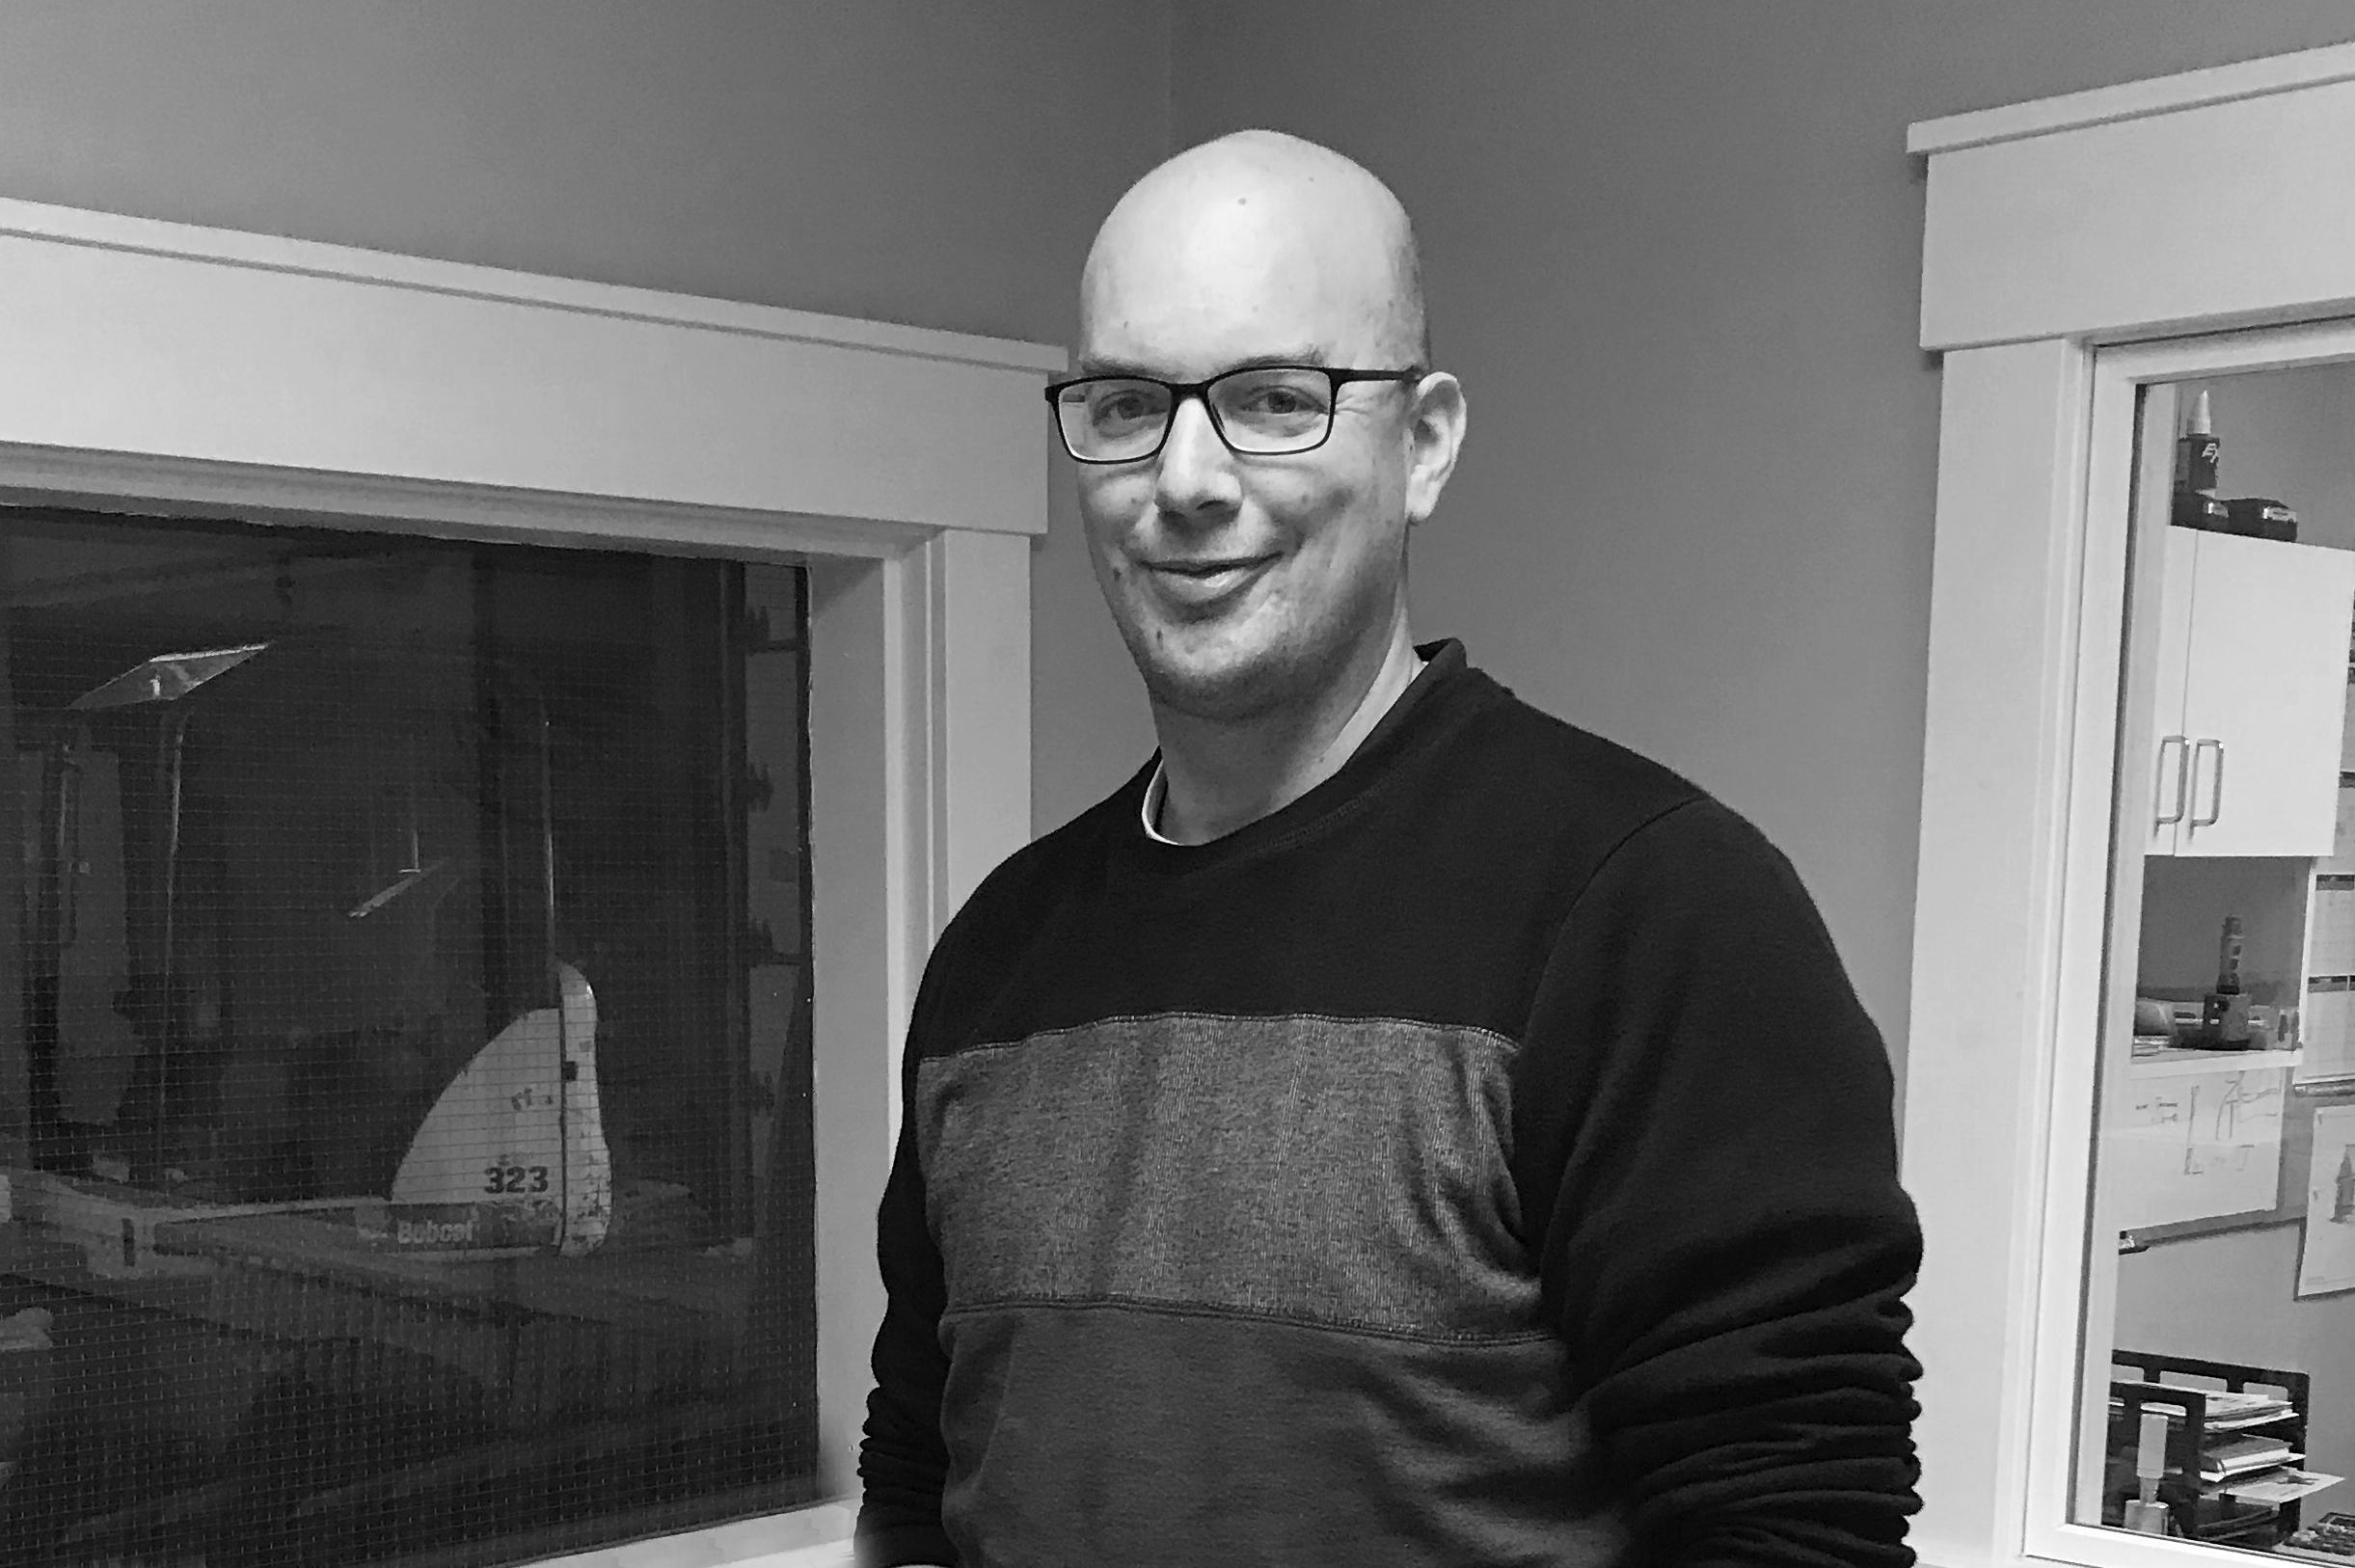 Tony Nijenhuis : Project Manager (x249)